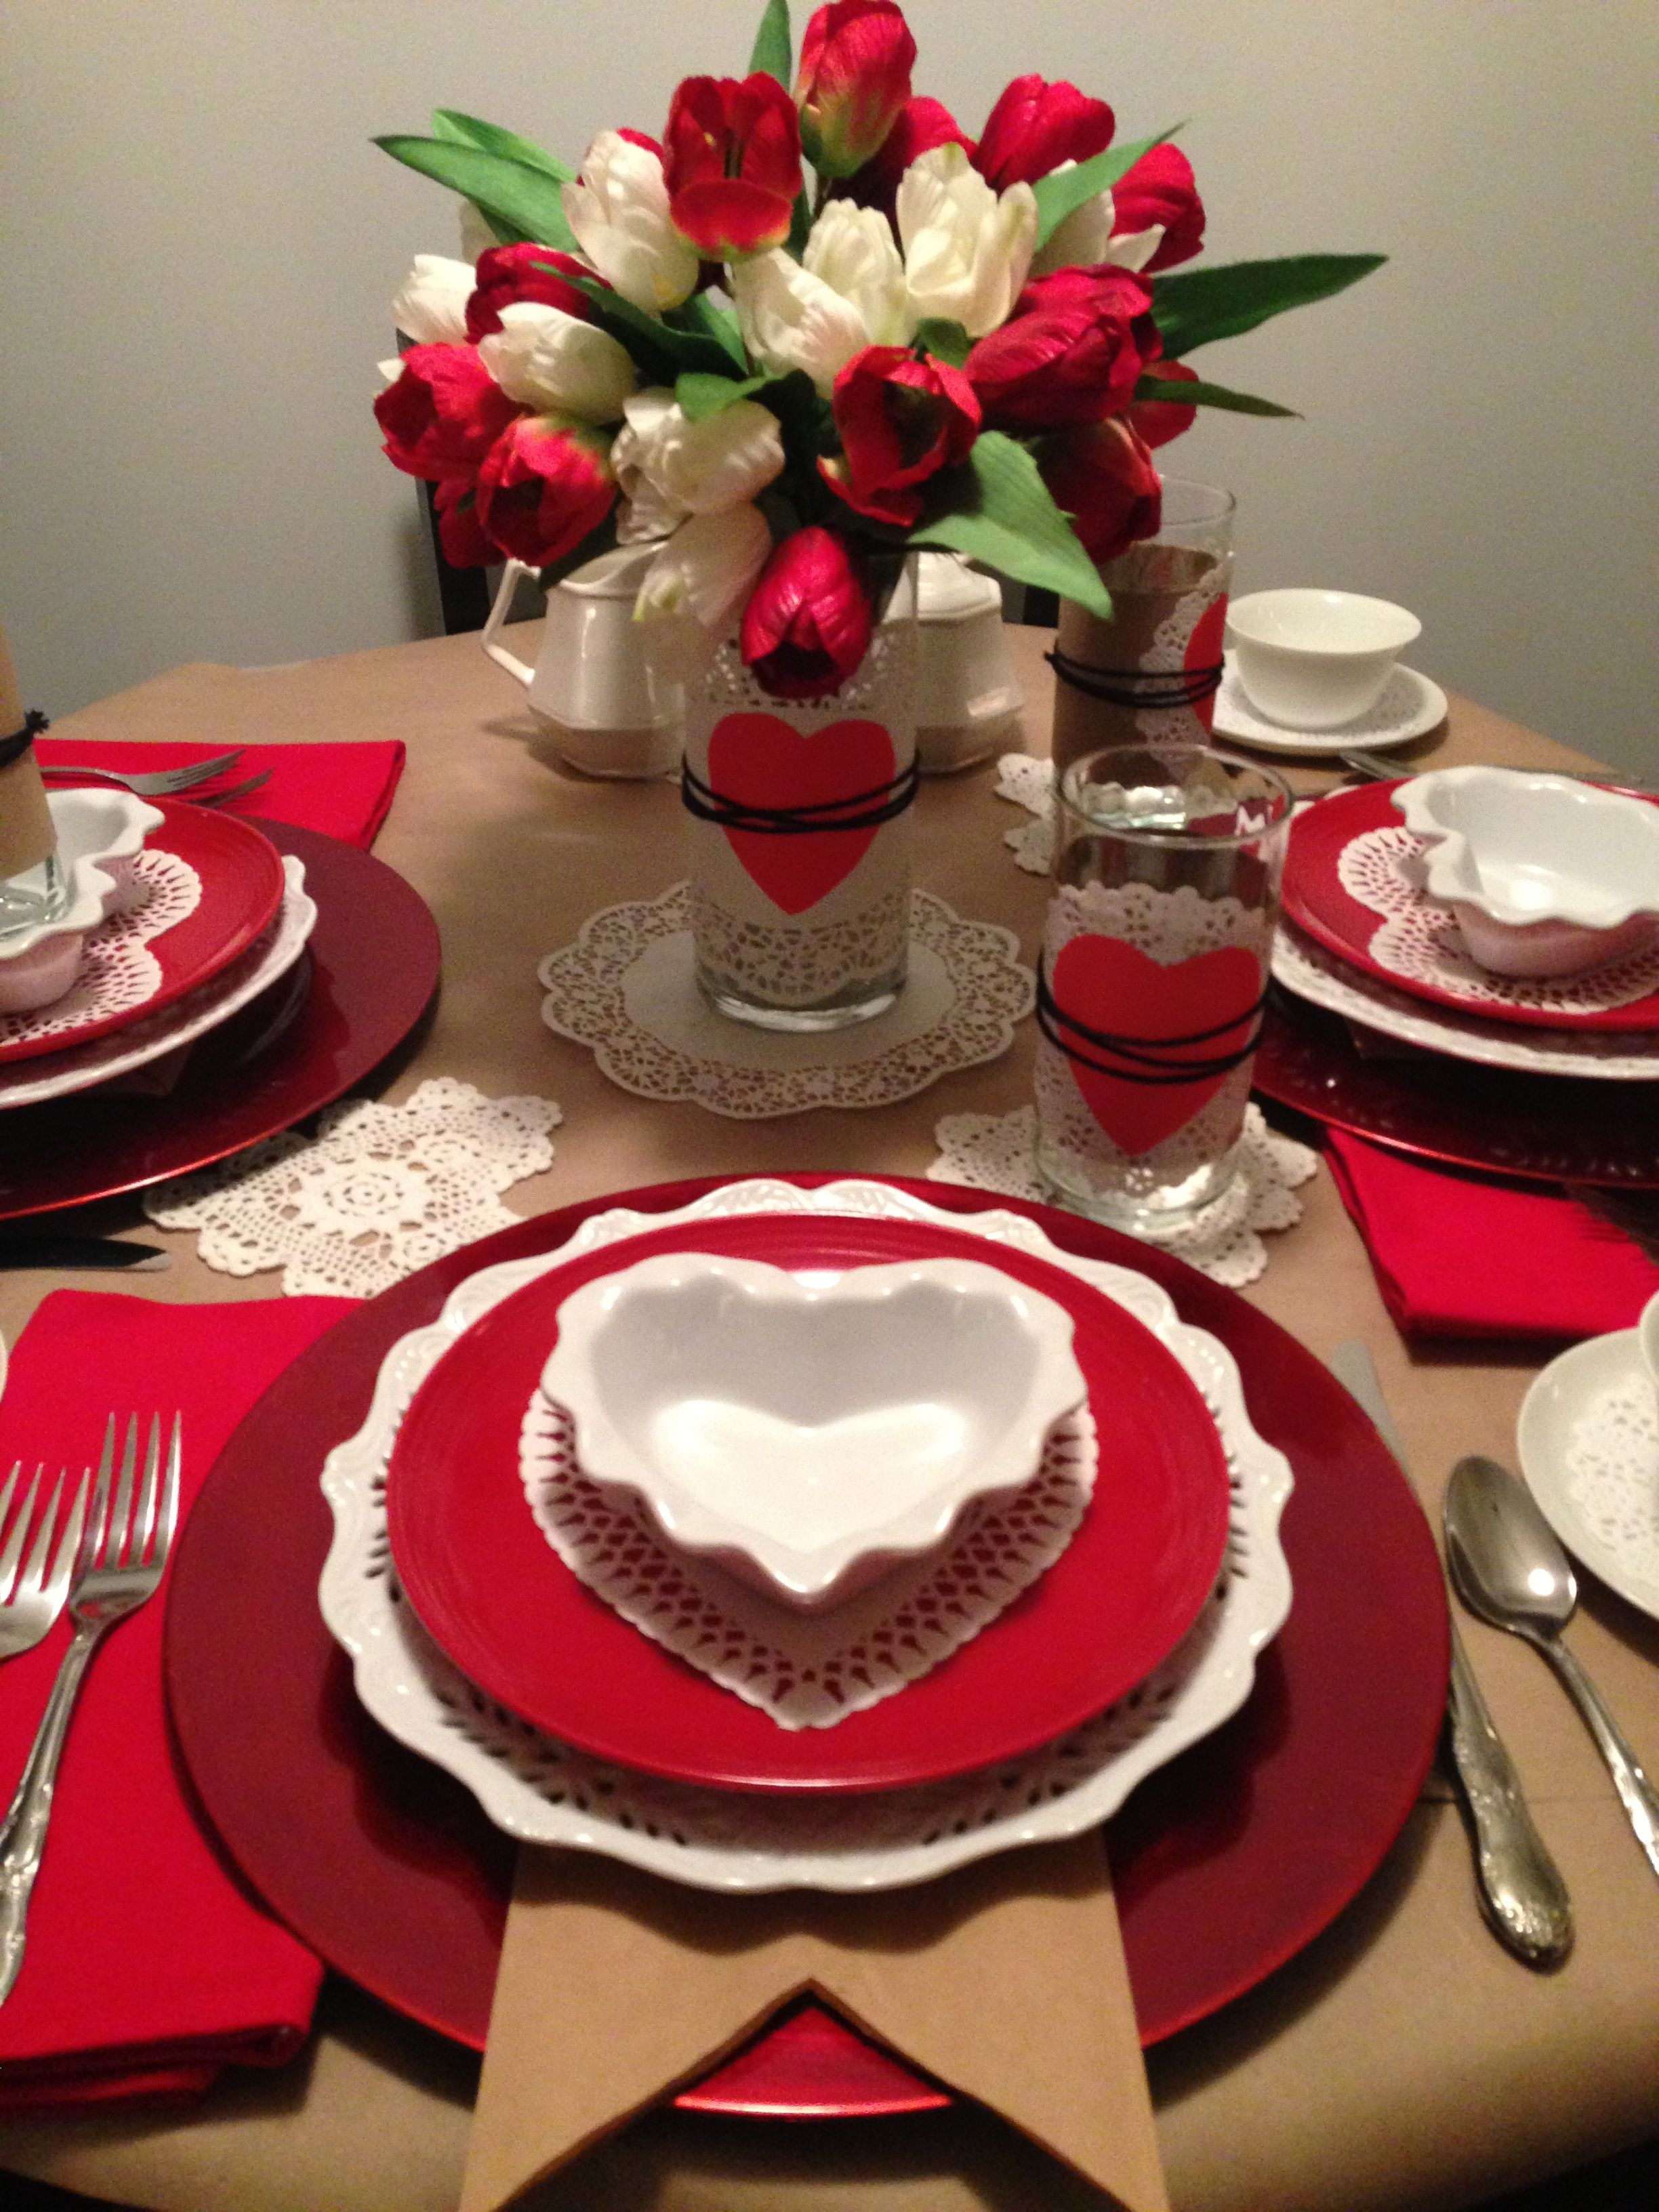 Ideias de Festa Junina | Tablescapes, Table settings and Holidays